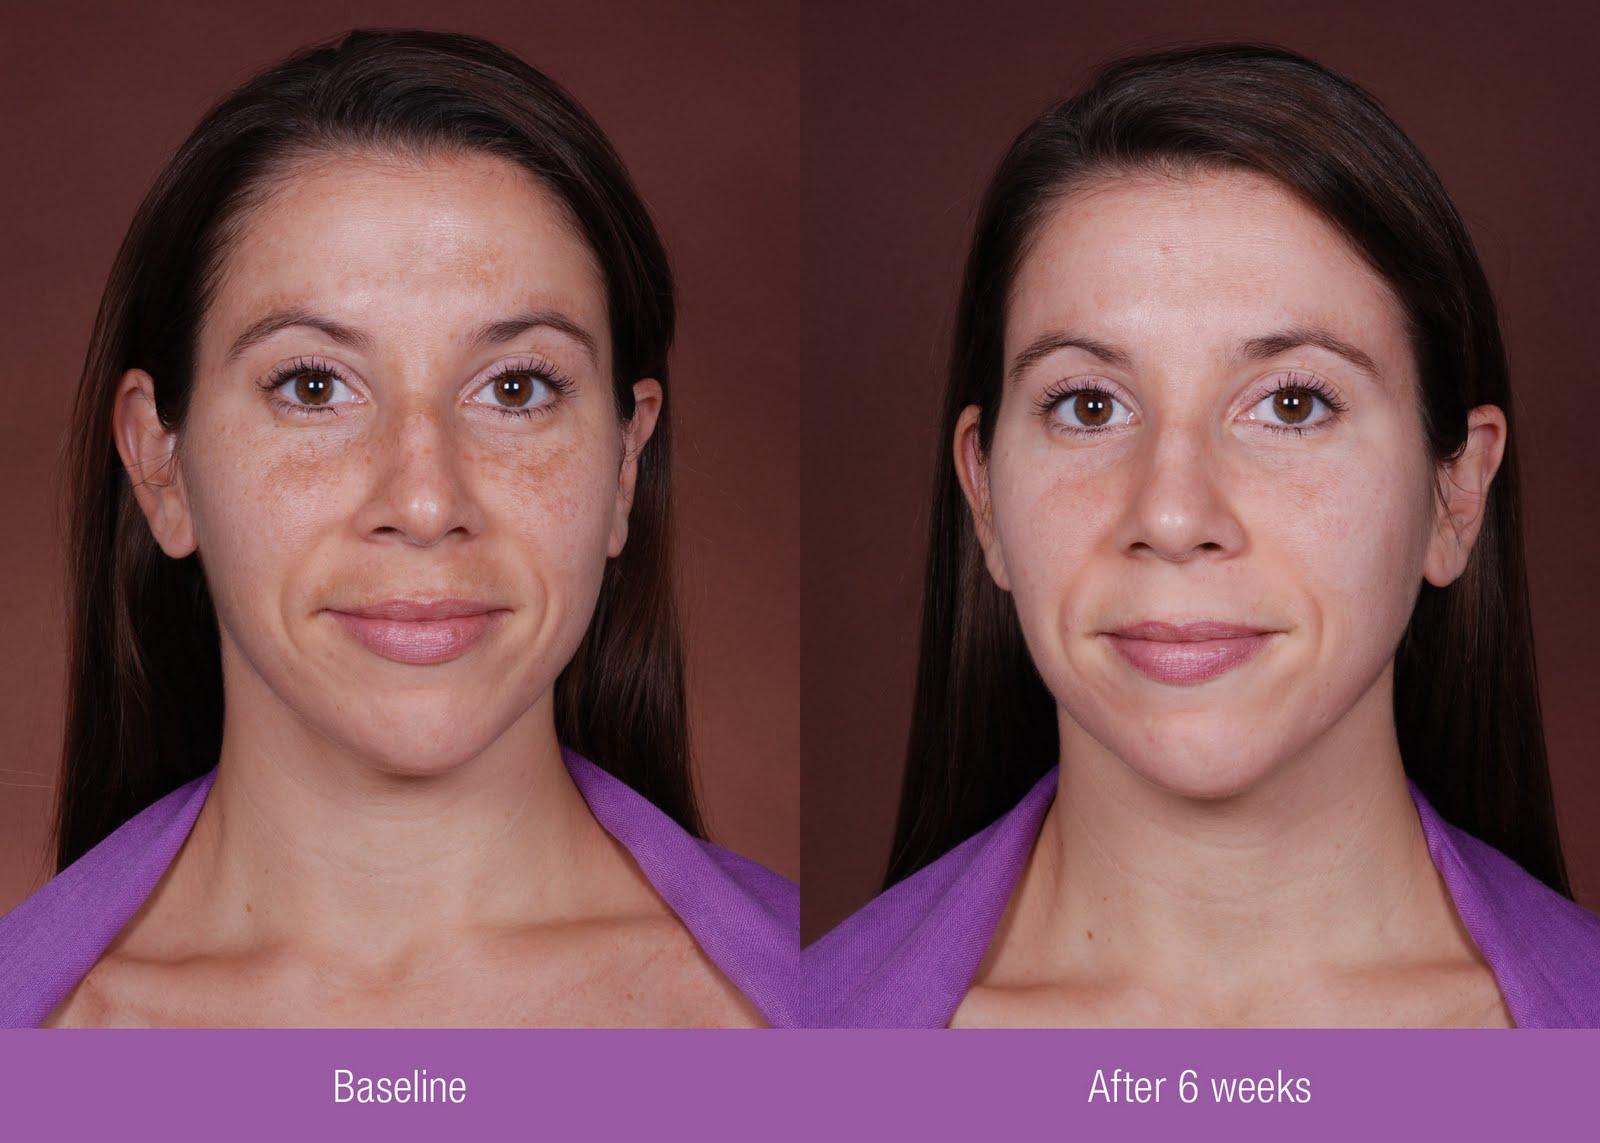 Tretinoin before moisturizer - CanadaDrugs: Canadian